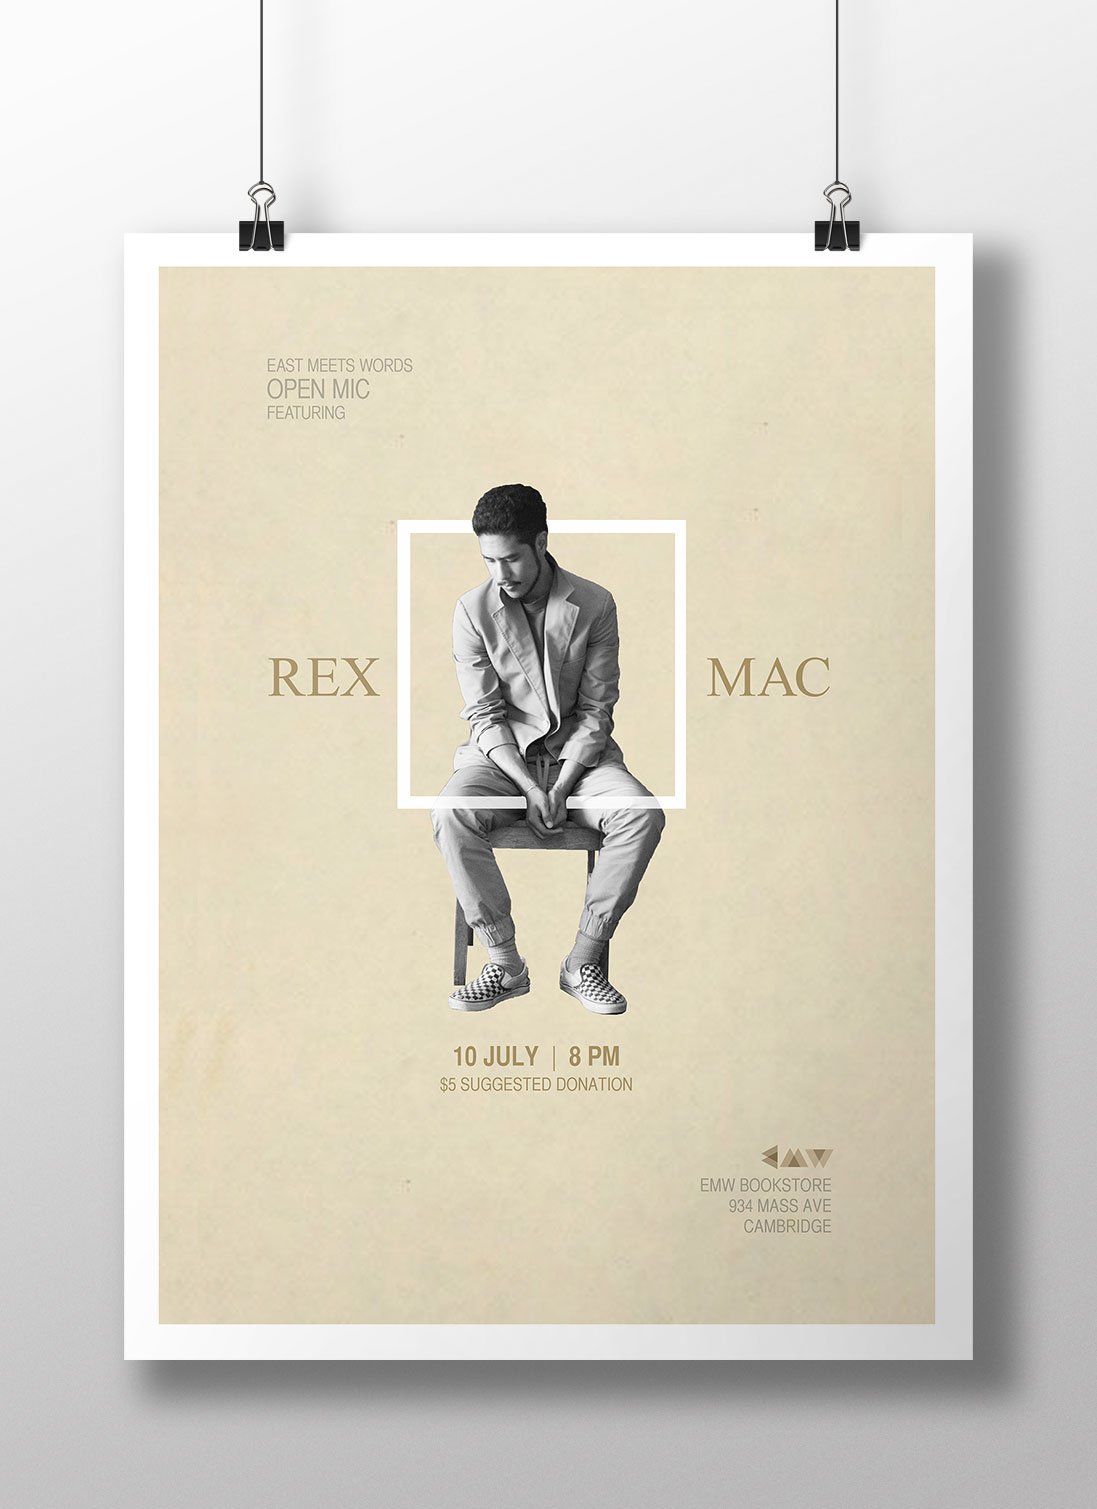 Rex-EMW-Poster.jpg